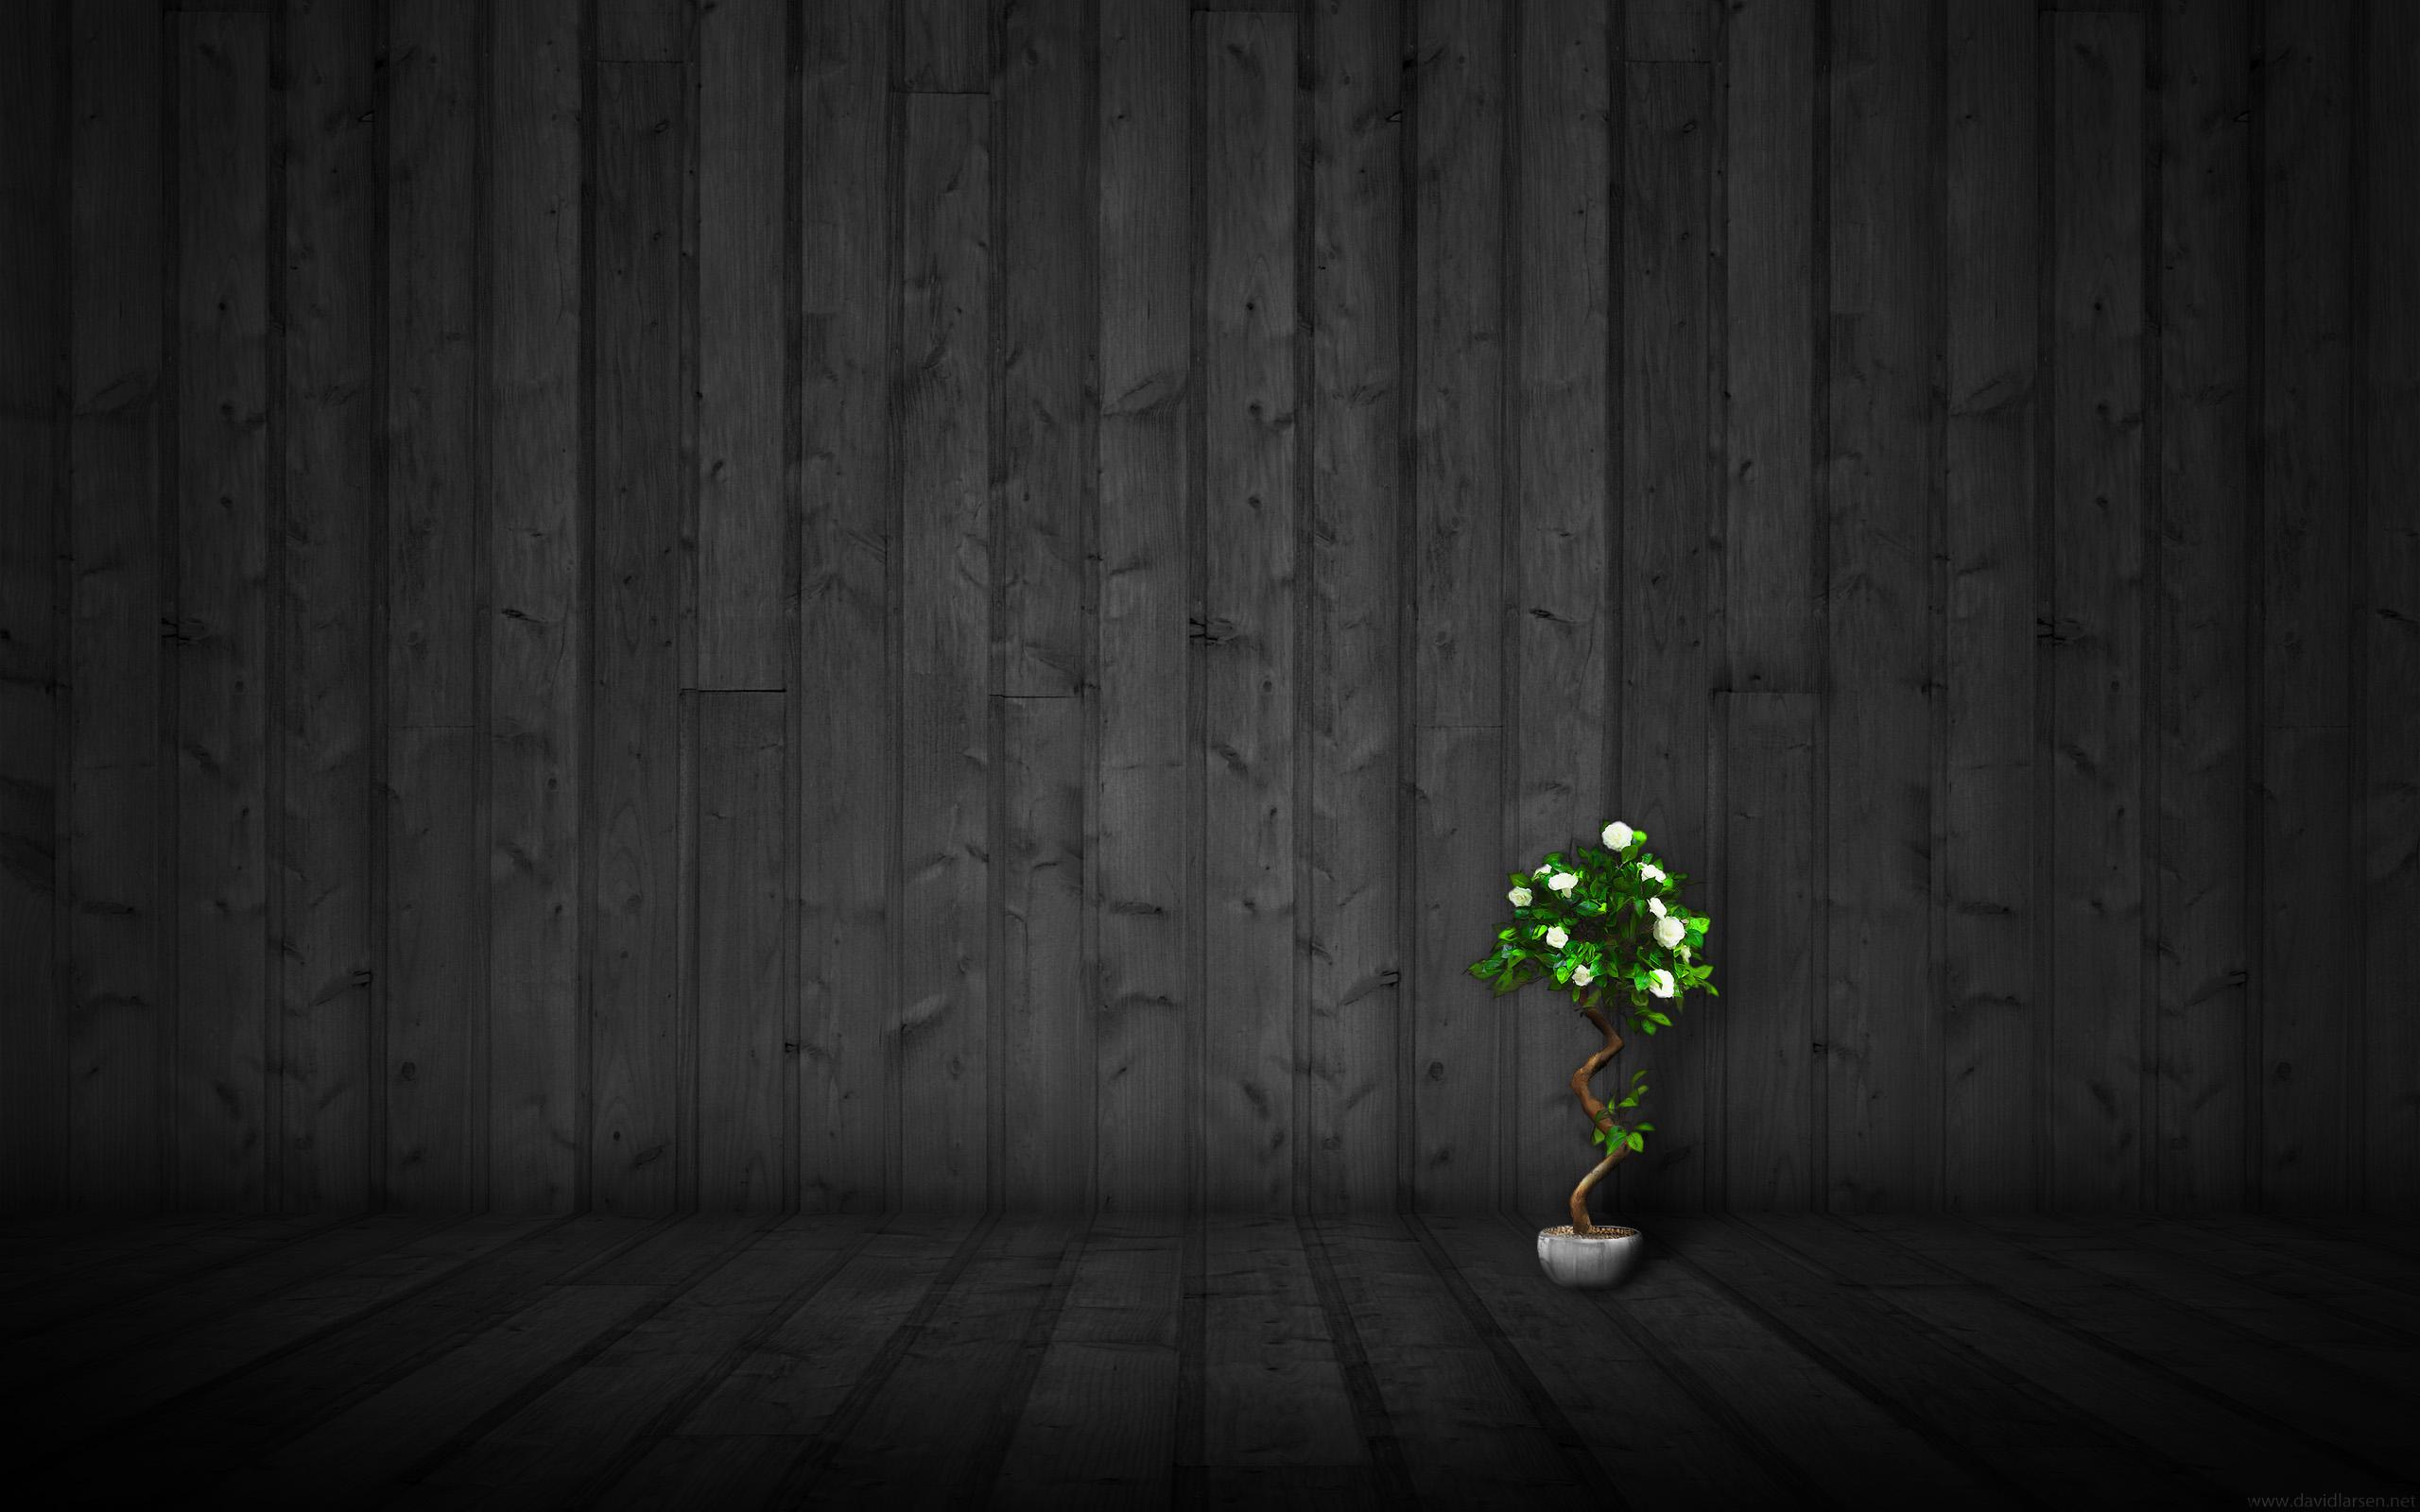 Hd wallpaper wood - Theme Bin Blog Archive Dark Wood 2 Hd Wallpaper